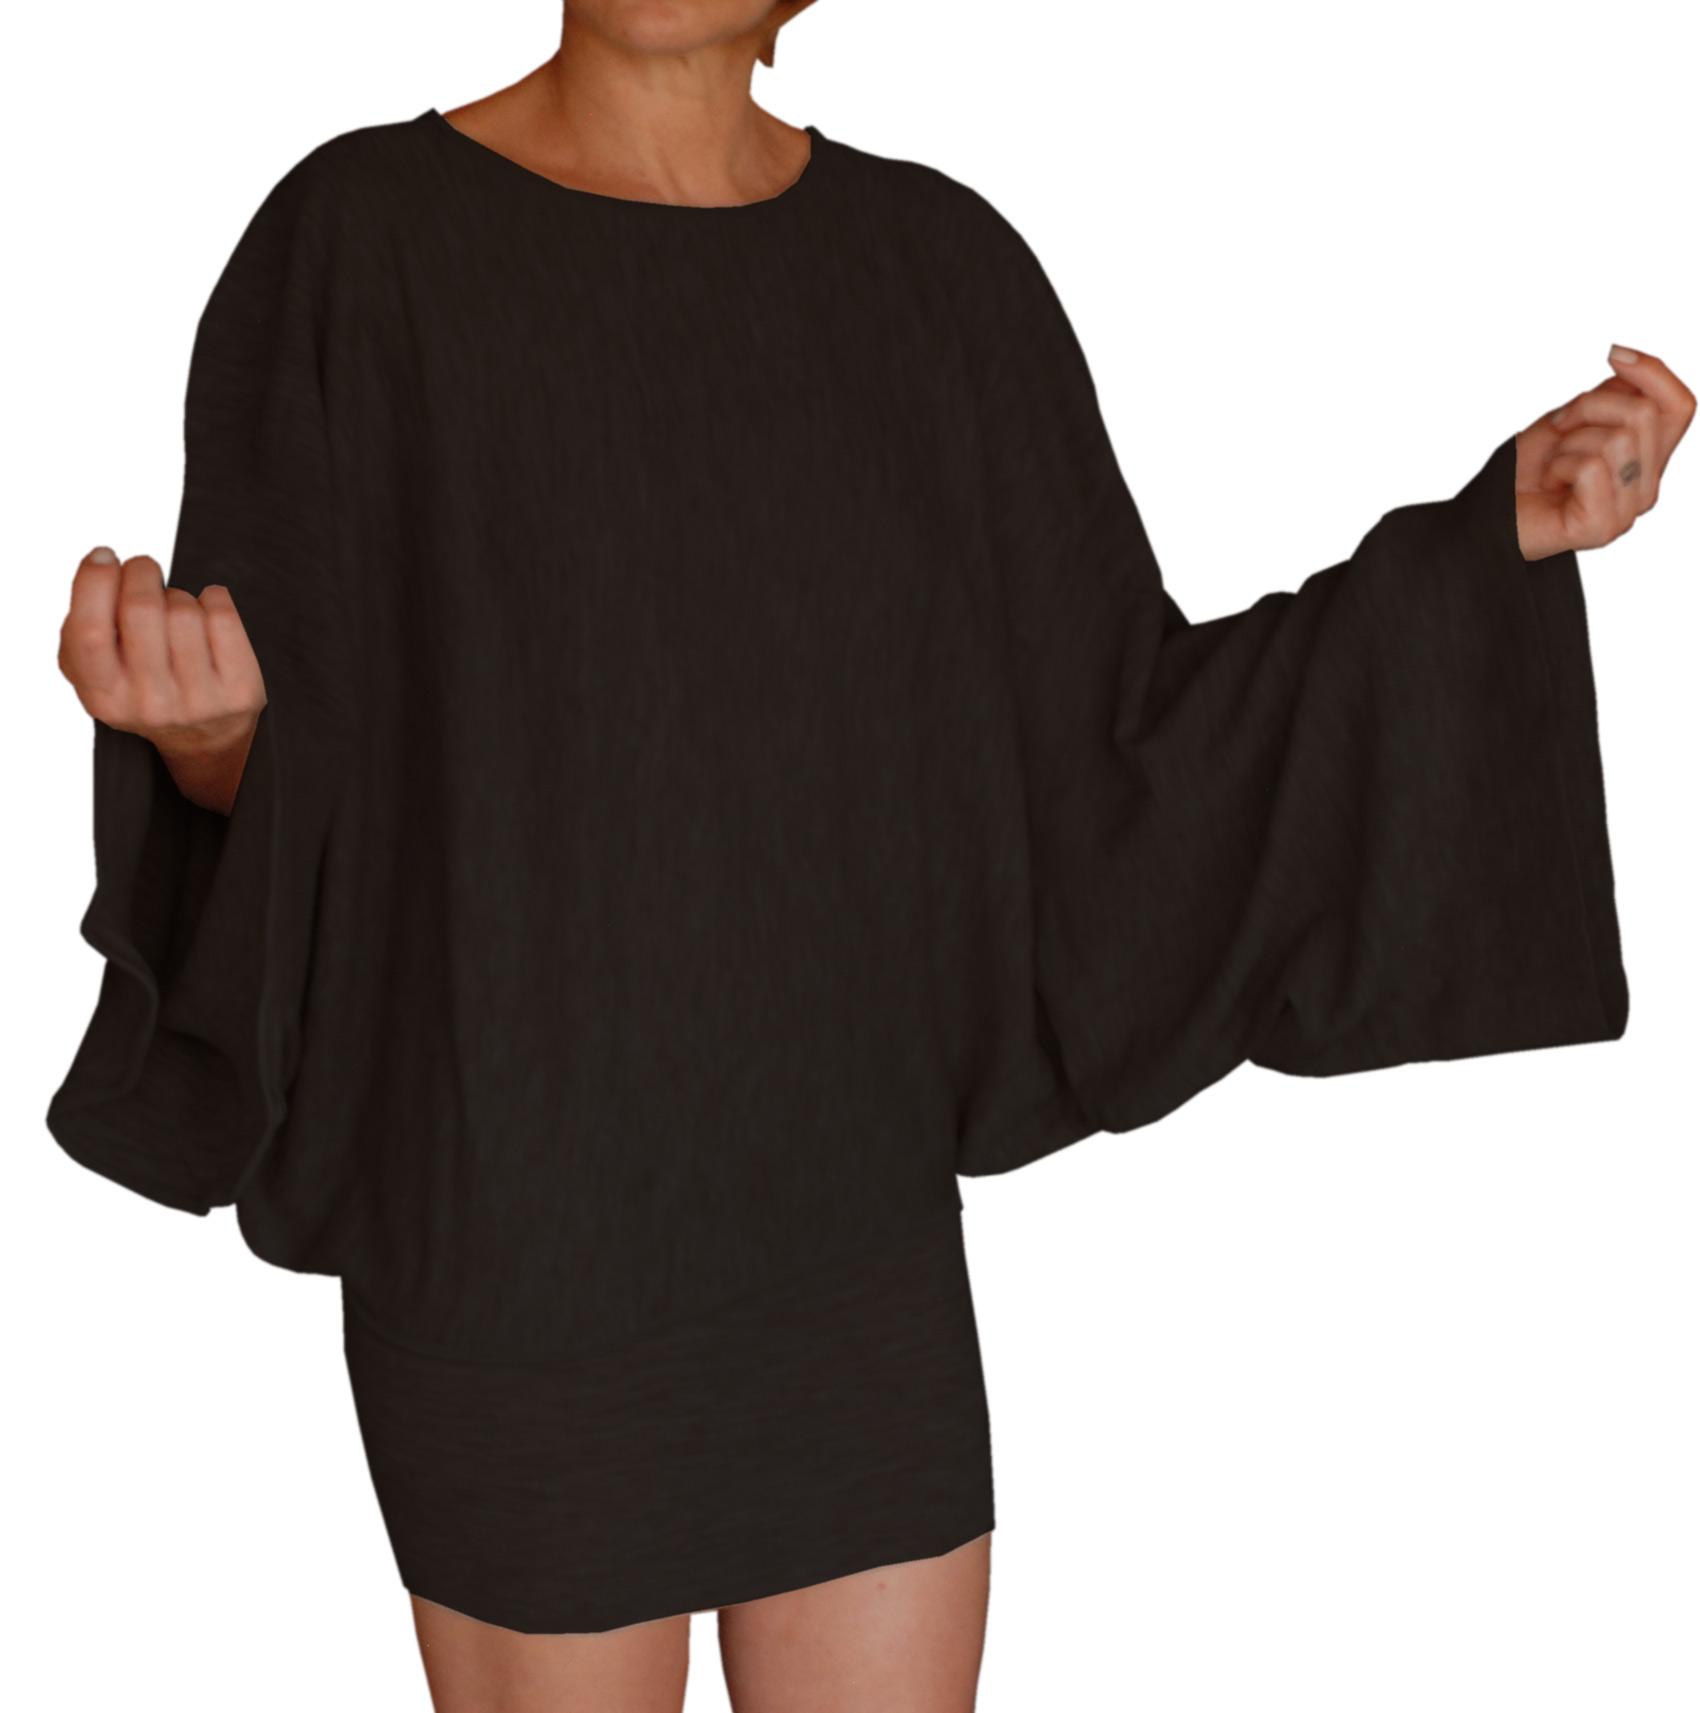 Travel garment -merino wool twin-set-versatile-multiway